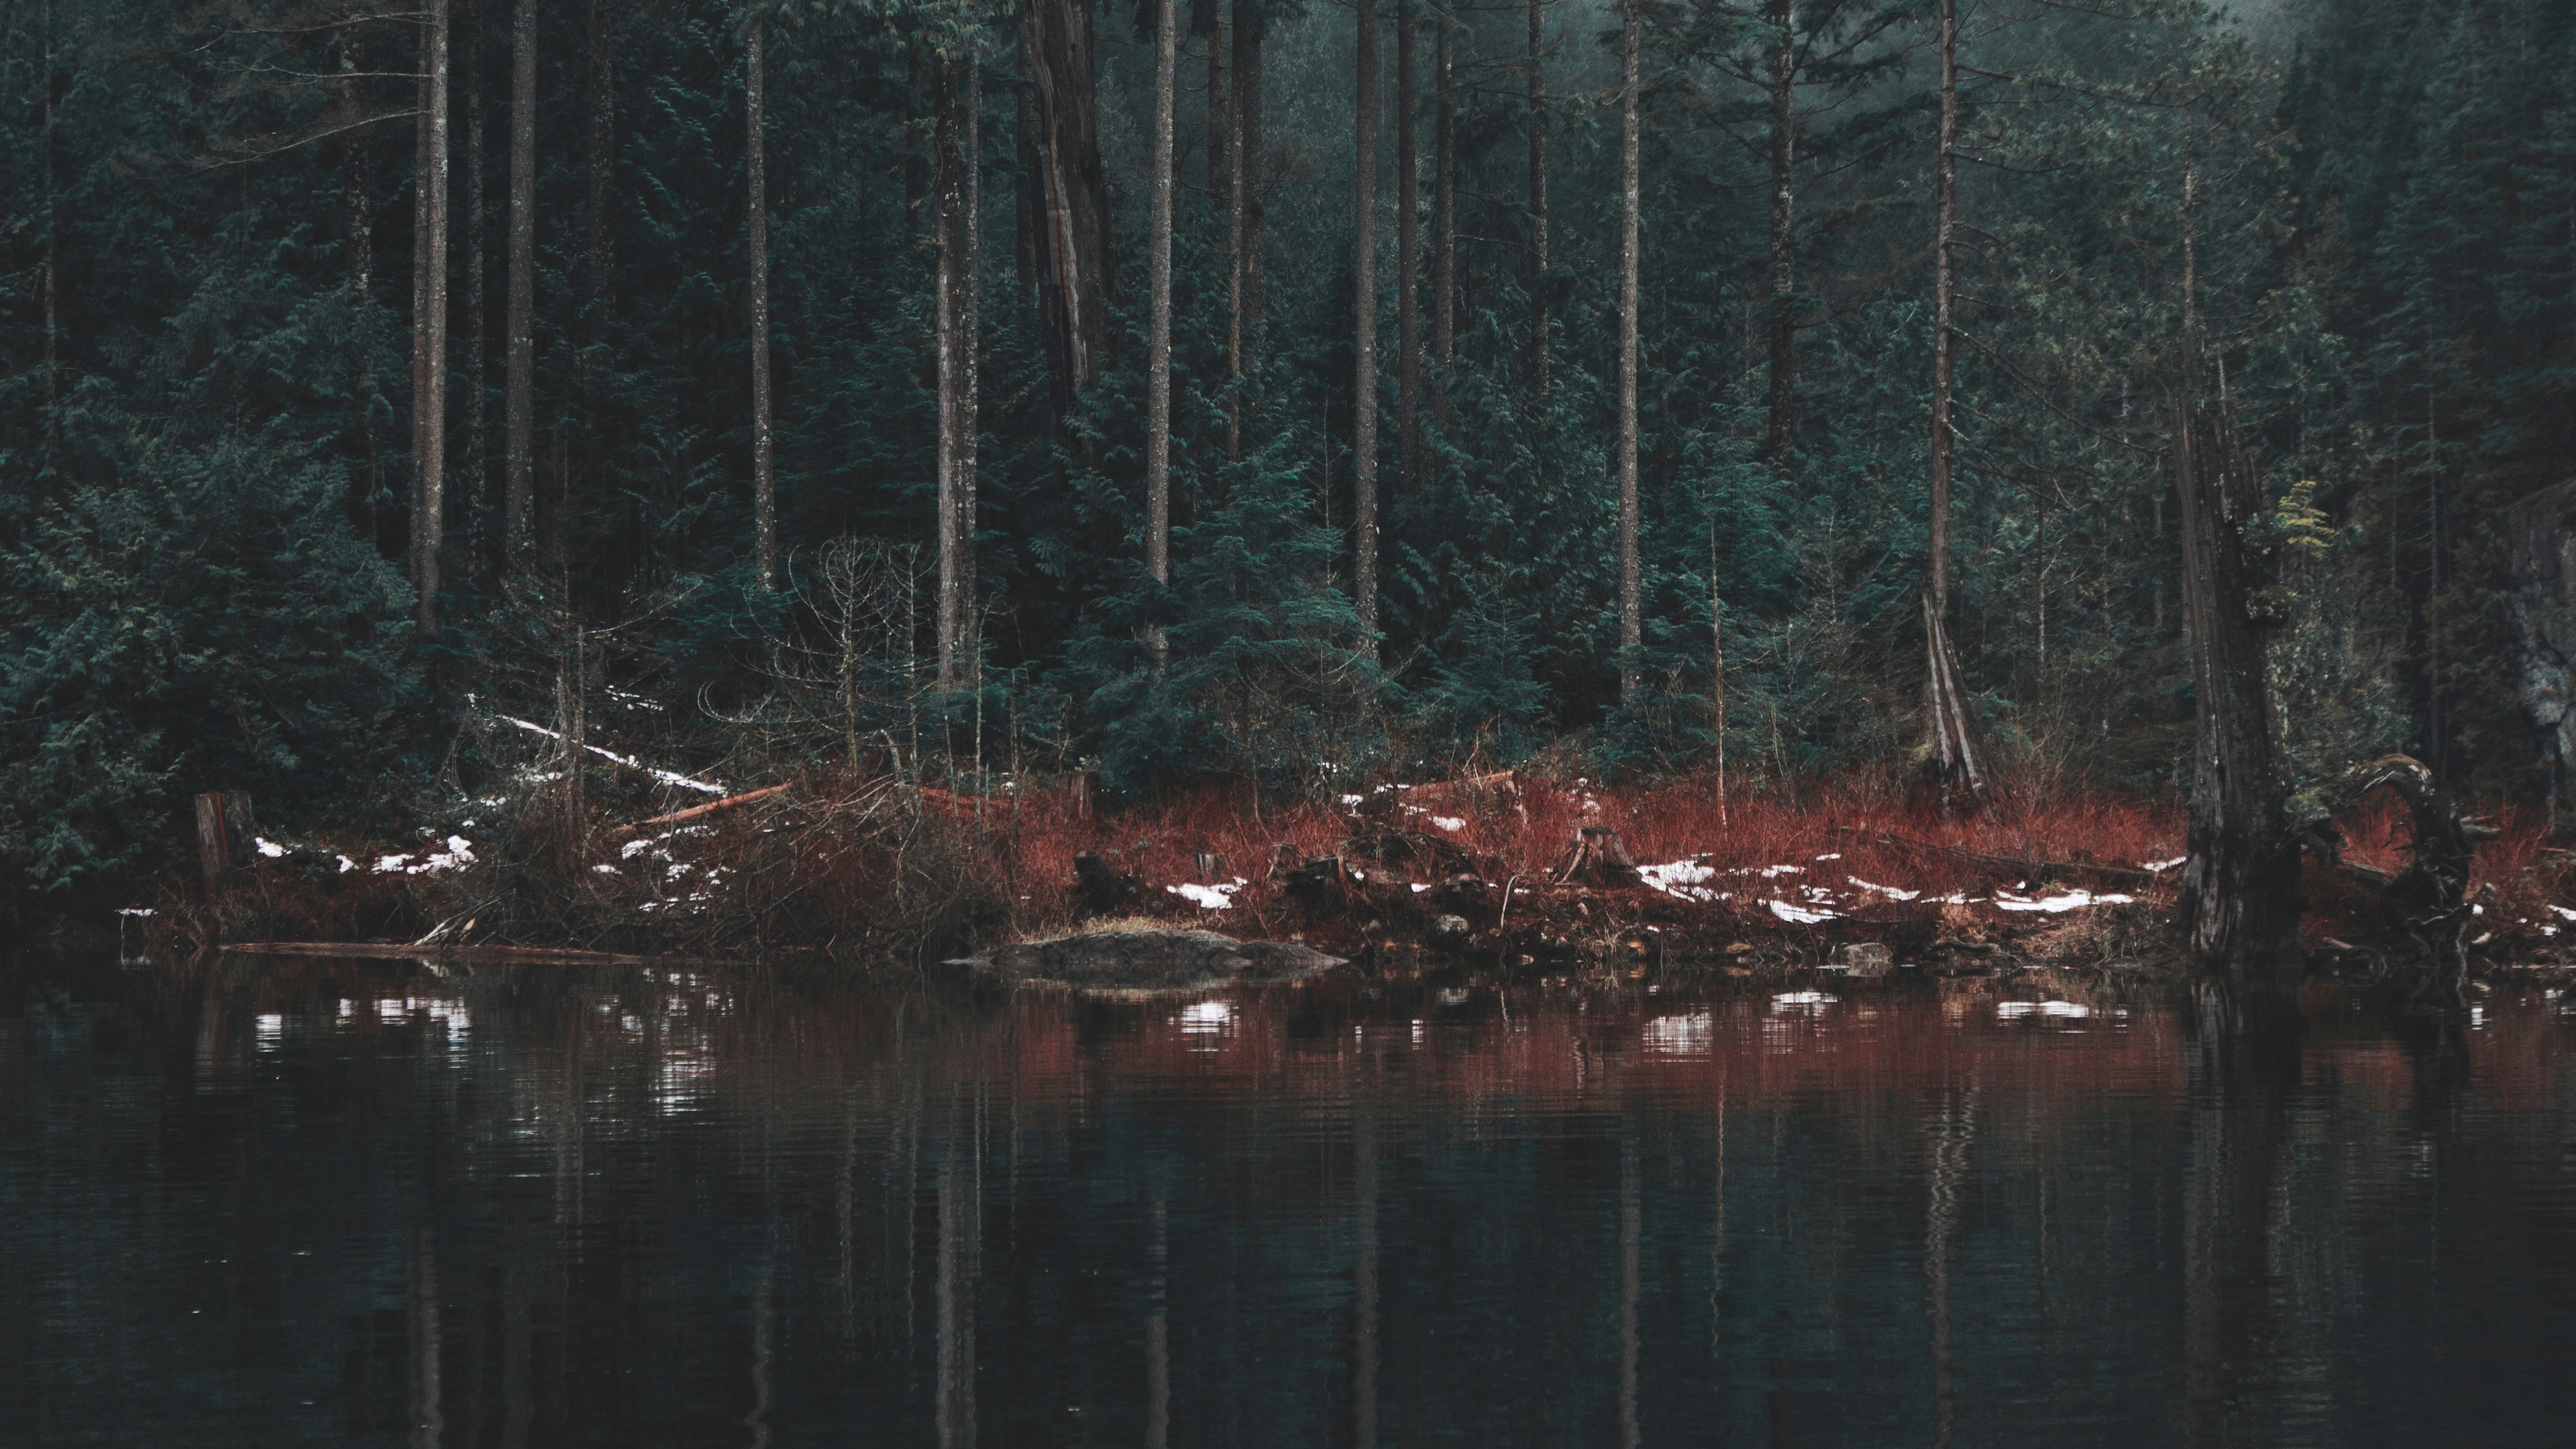 4k山 湖海 日落 日出 森林等壁纸图片